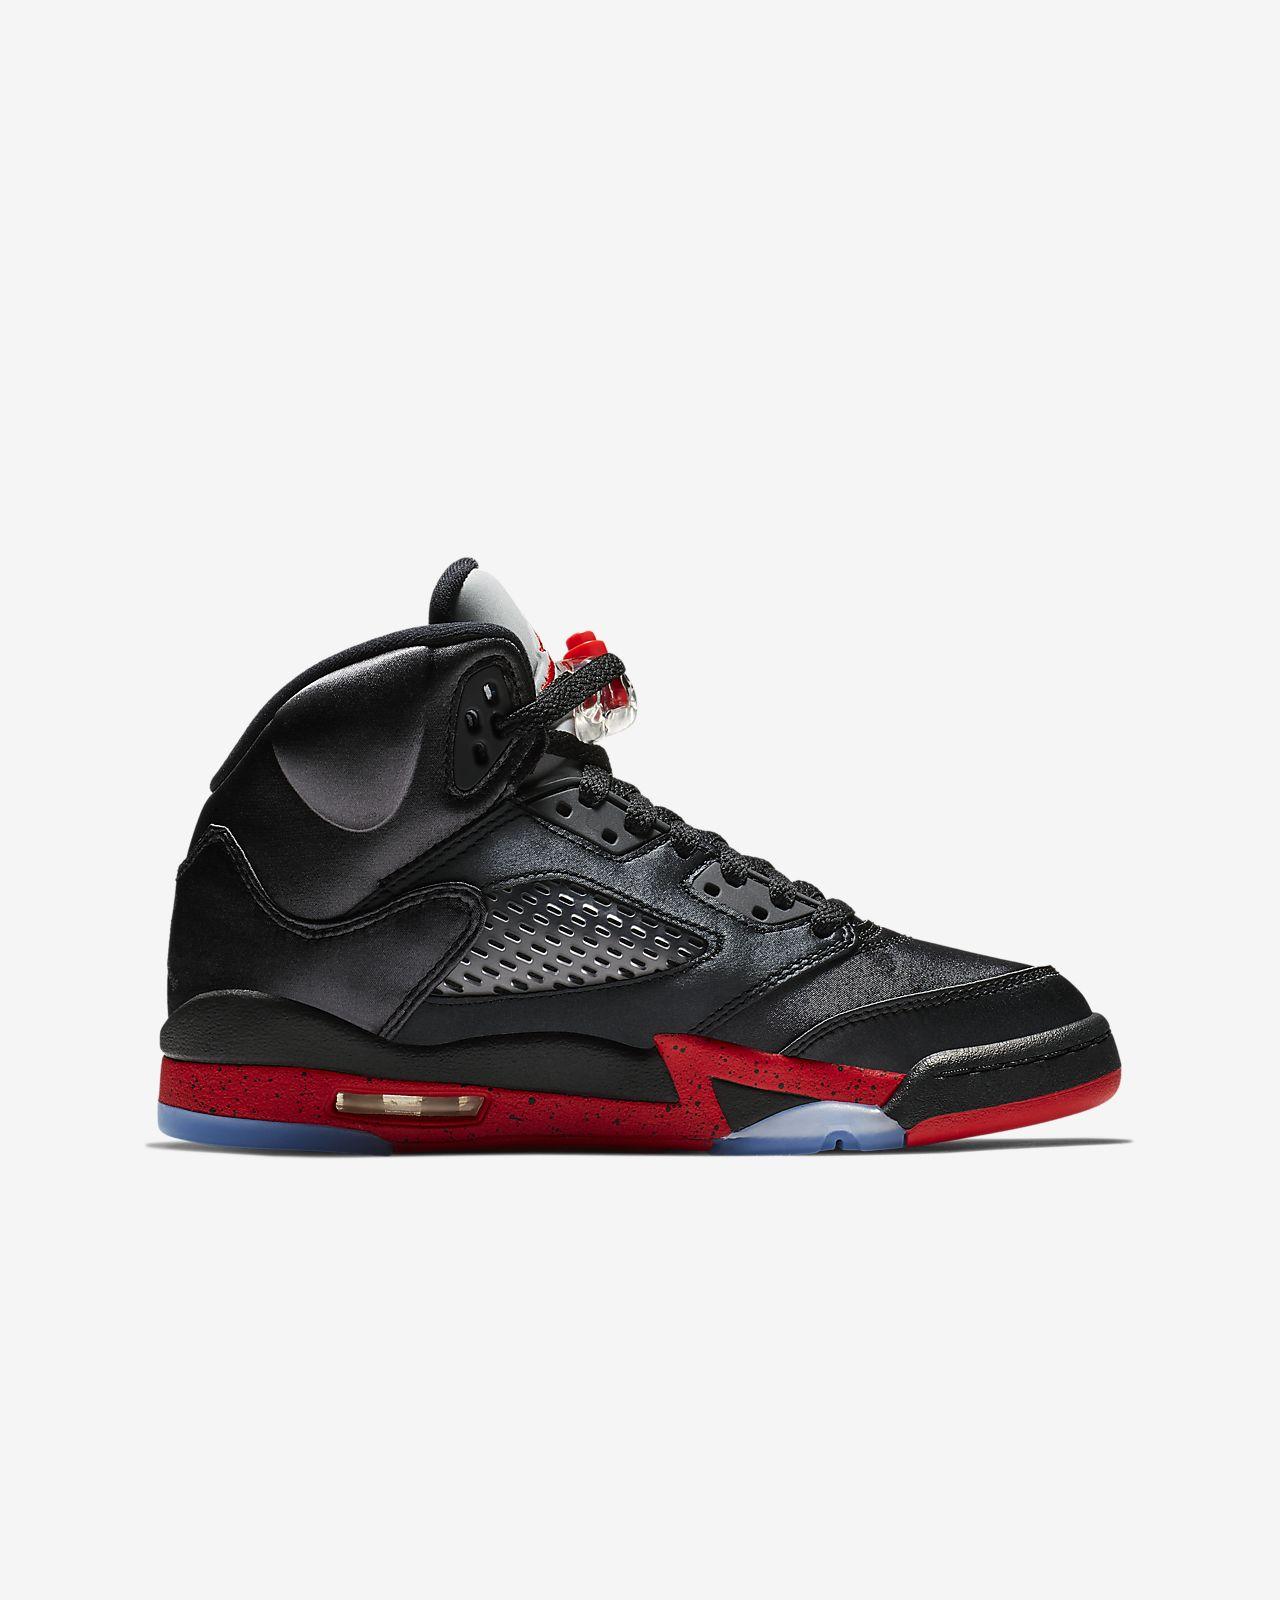 super popular 6ae2c 1ec81 ... Air Jordan 5 Retro Schuh für ältere Kinder